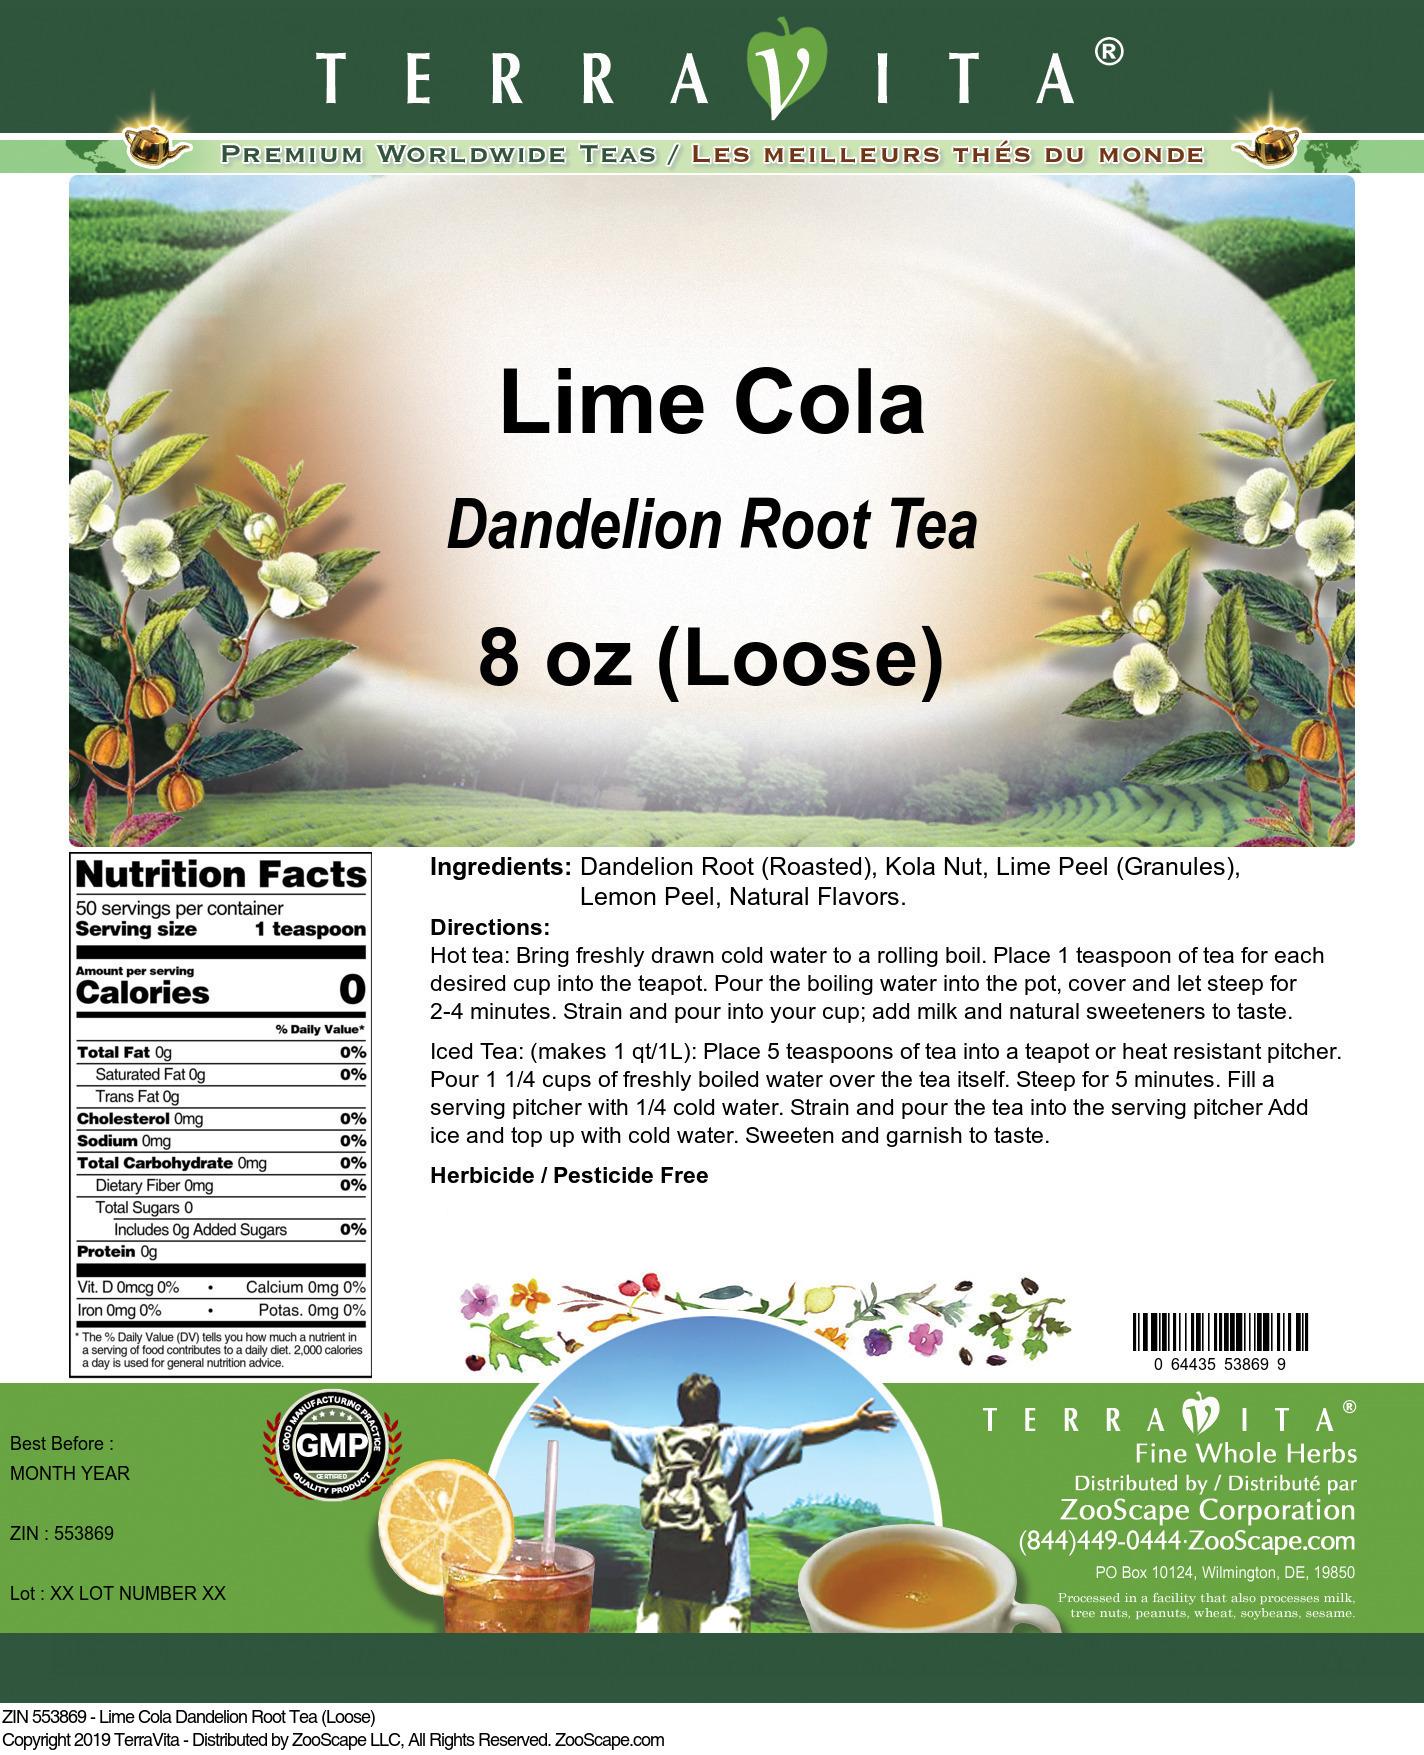 Lime Cola Dandelion Root